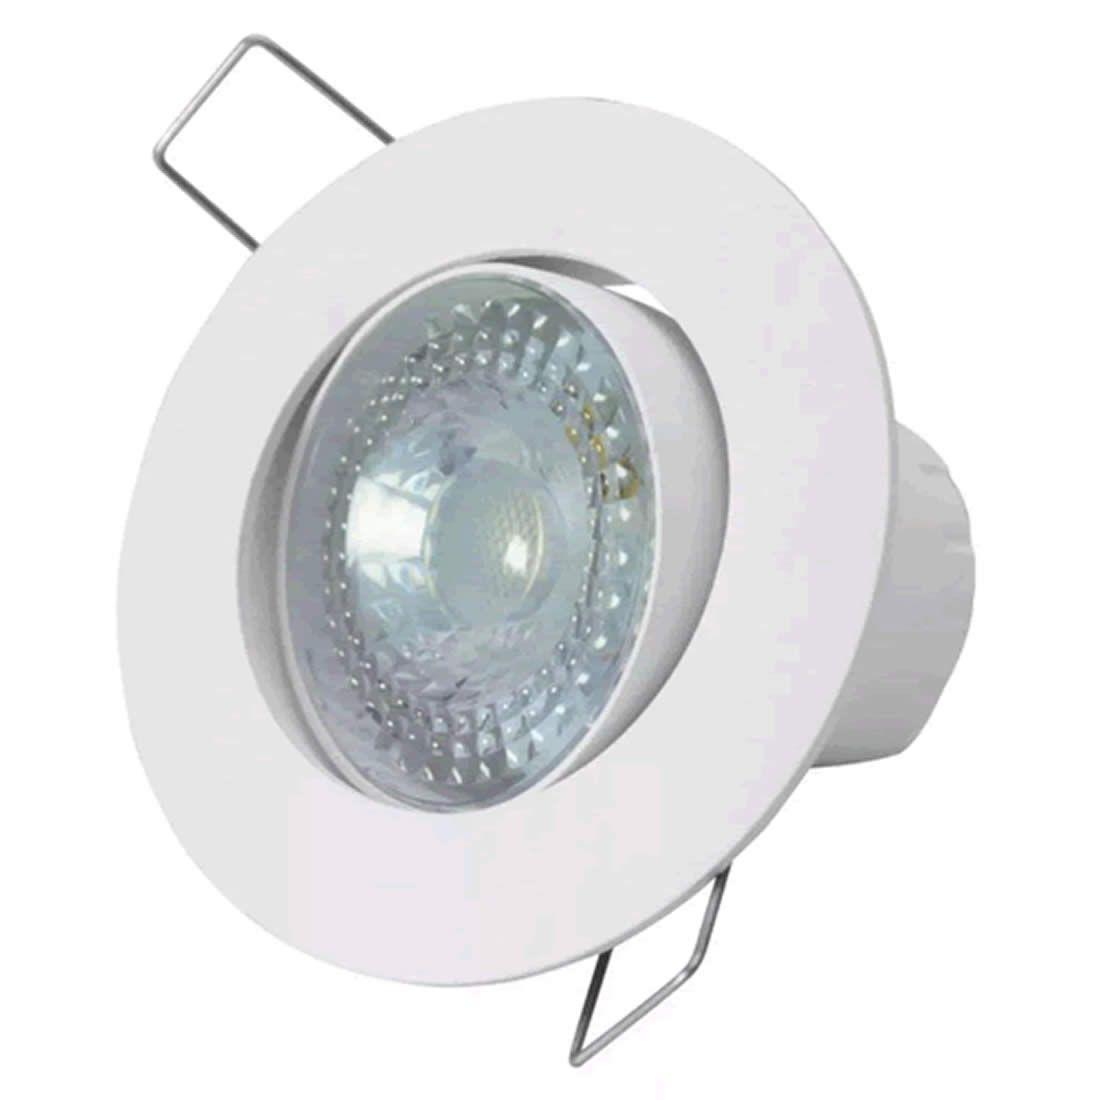 Luminária de Led Taschibra Spot Embutir Redonda 5W 3000K